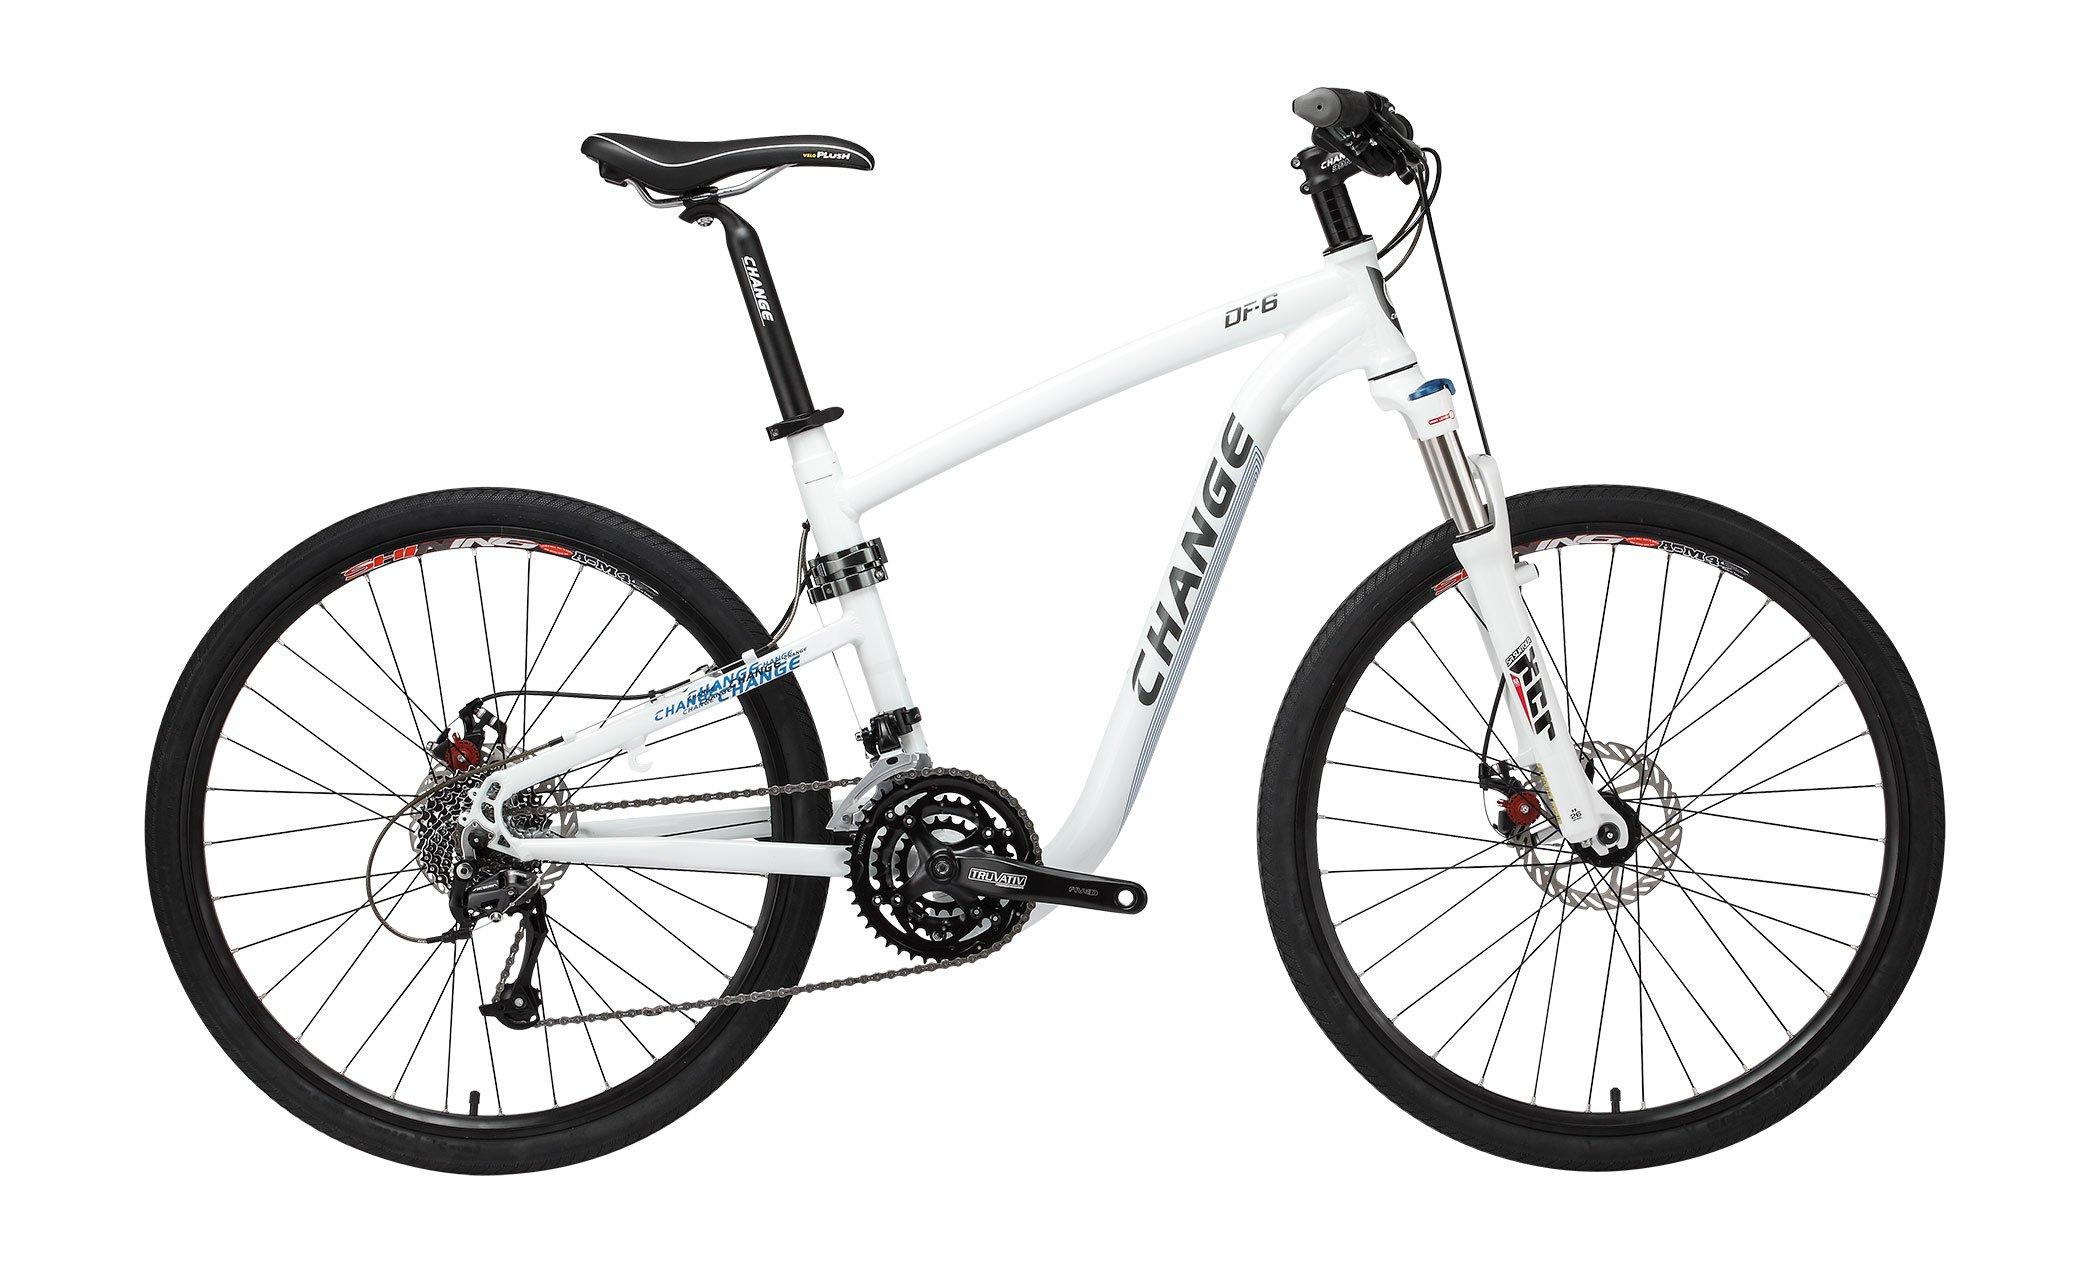 change bike 609 lightweight folding mountain bike light yet rugged rh flatbike com Mountain Bike Parts Mountain Bike Frame Diagram